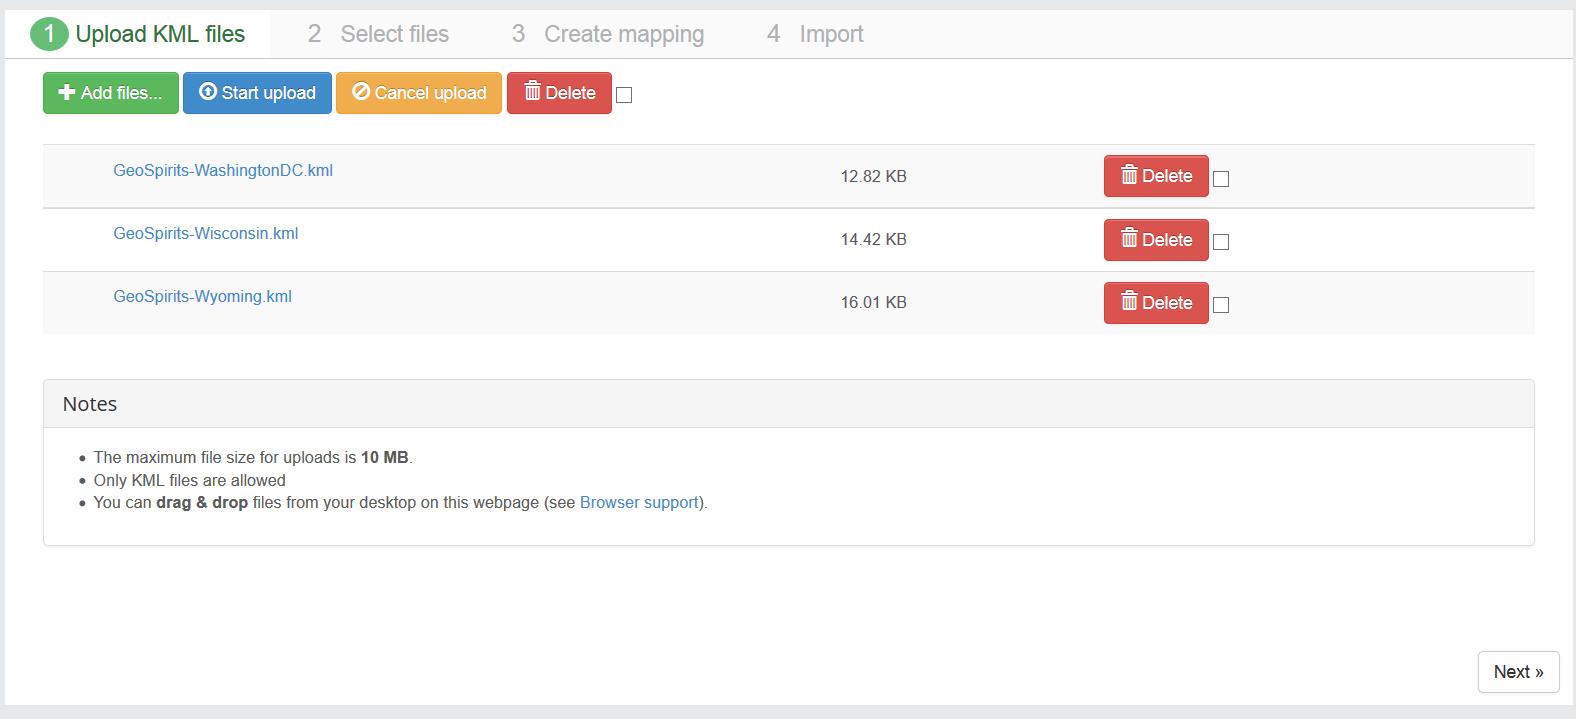 Hotspots Advanced Google Maps Manager For Joomla Compojoomcom - Google maps us states kml